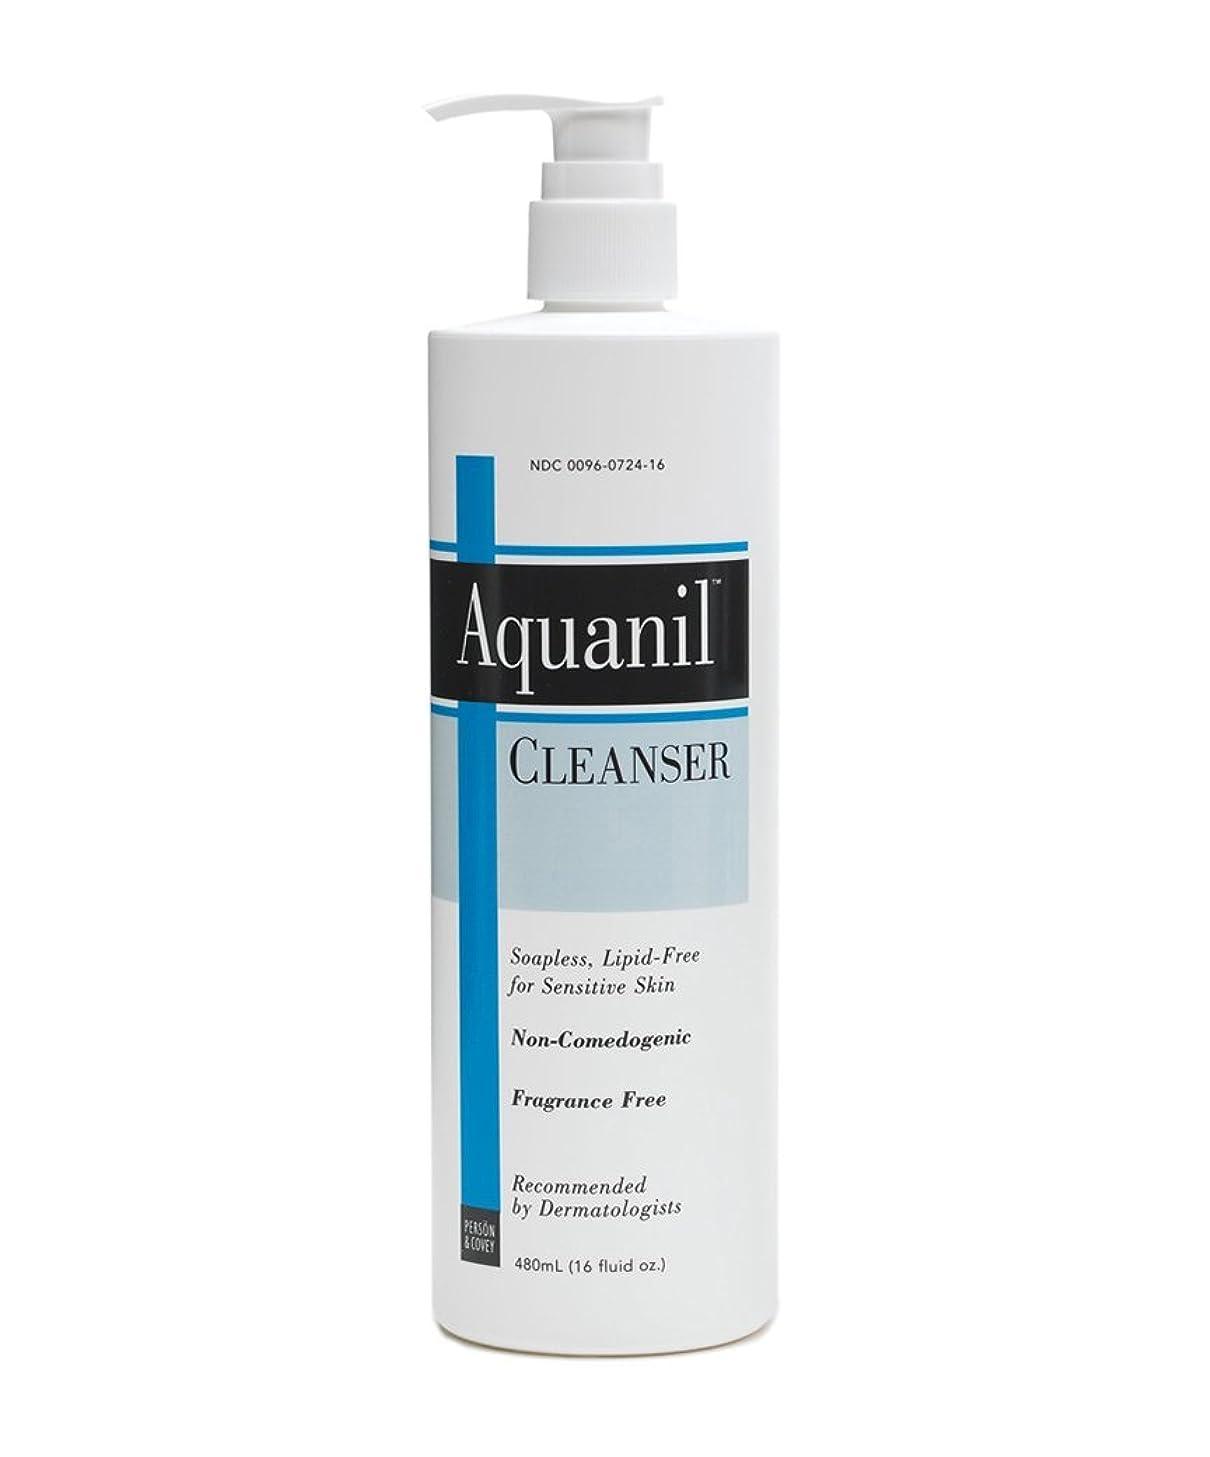 冒険宇宙飛行士無限海外直送肘 Aquanil Cleanser A Gentle Soapless Lipid-Free, 16 oz